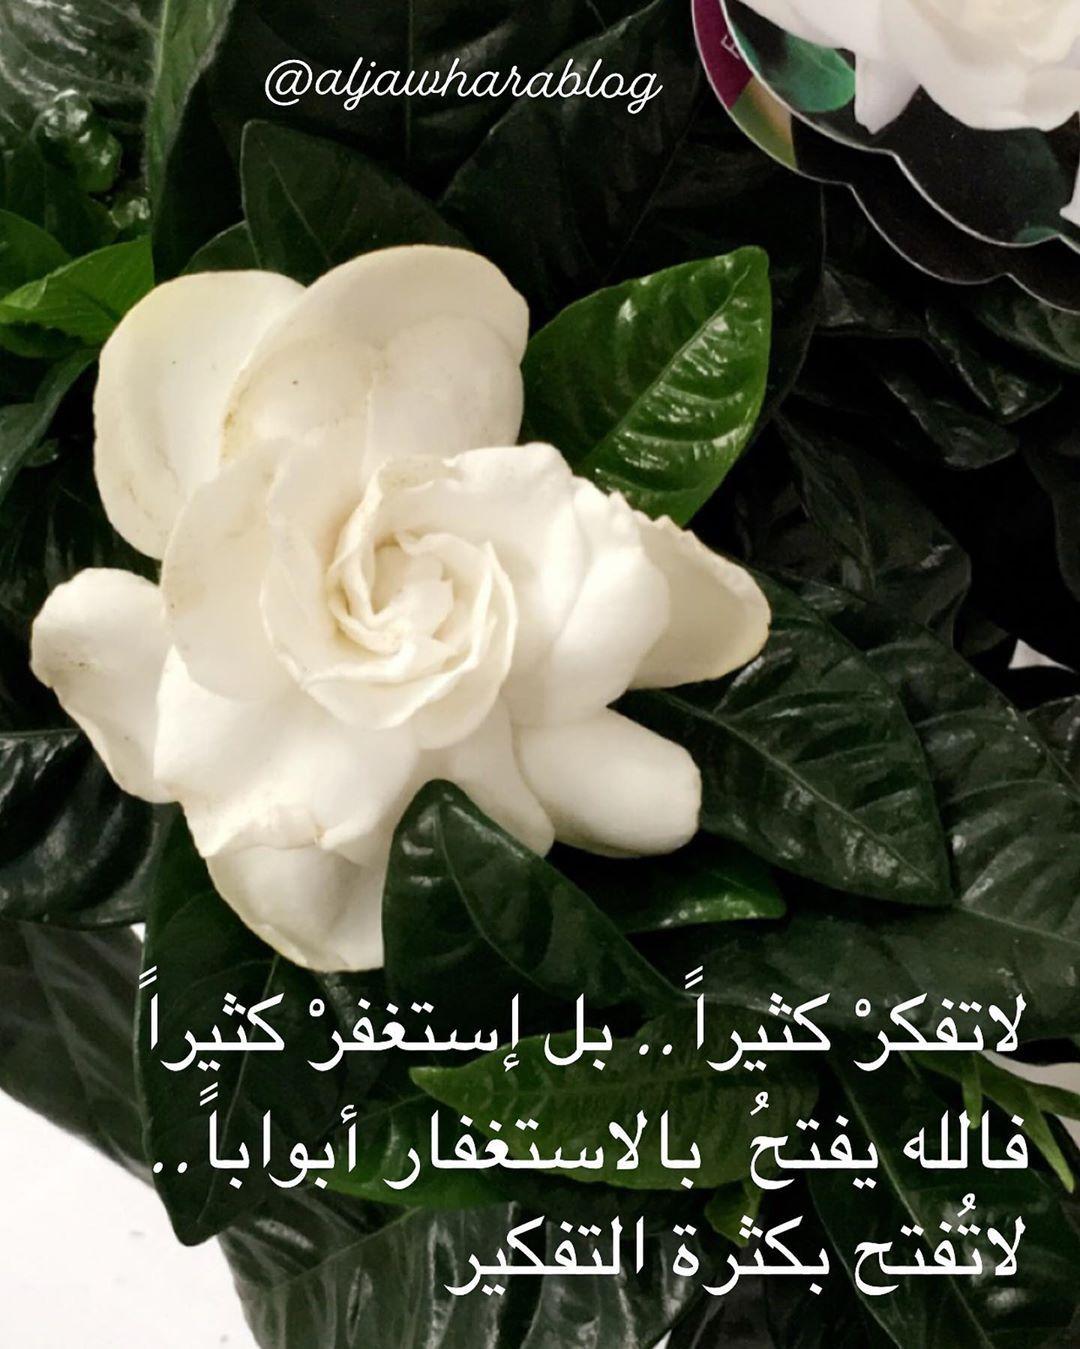 Aljawharalab On Instagram صباحكم أبيض كبياض قلوبكم النقية أبدؤا يومكم بإبتسامة من القلب وكونوا على ثقة بالله دعاء صباح الخير يوم Flowers Plants Rose